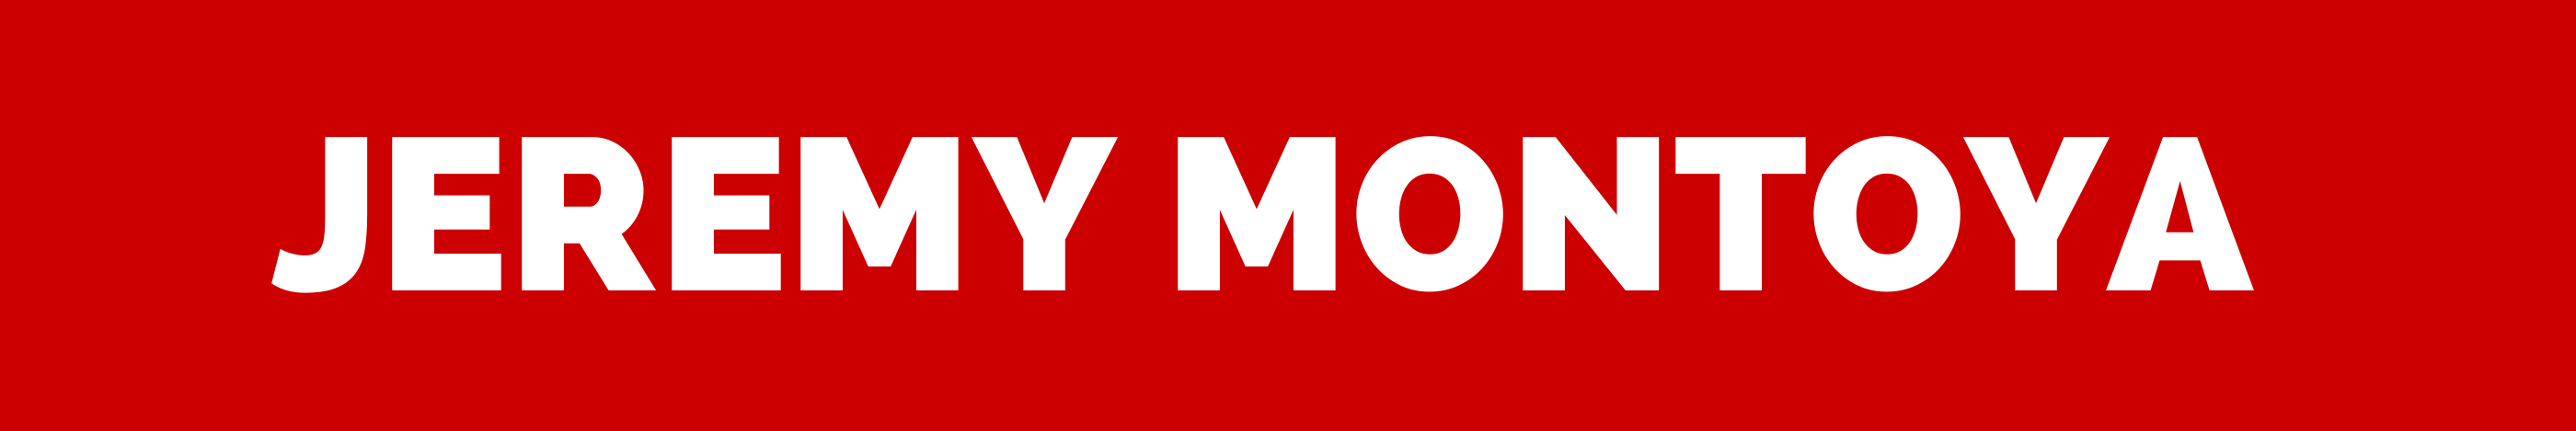 Jeremy Montoya header image